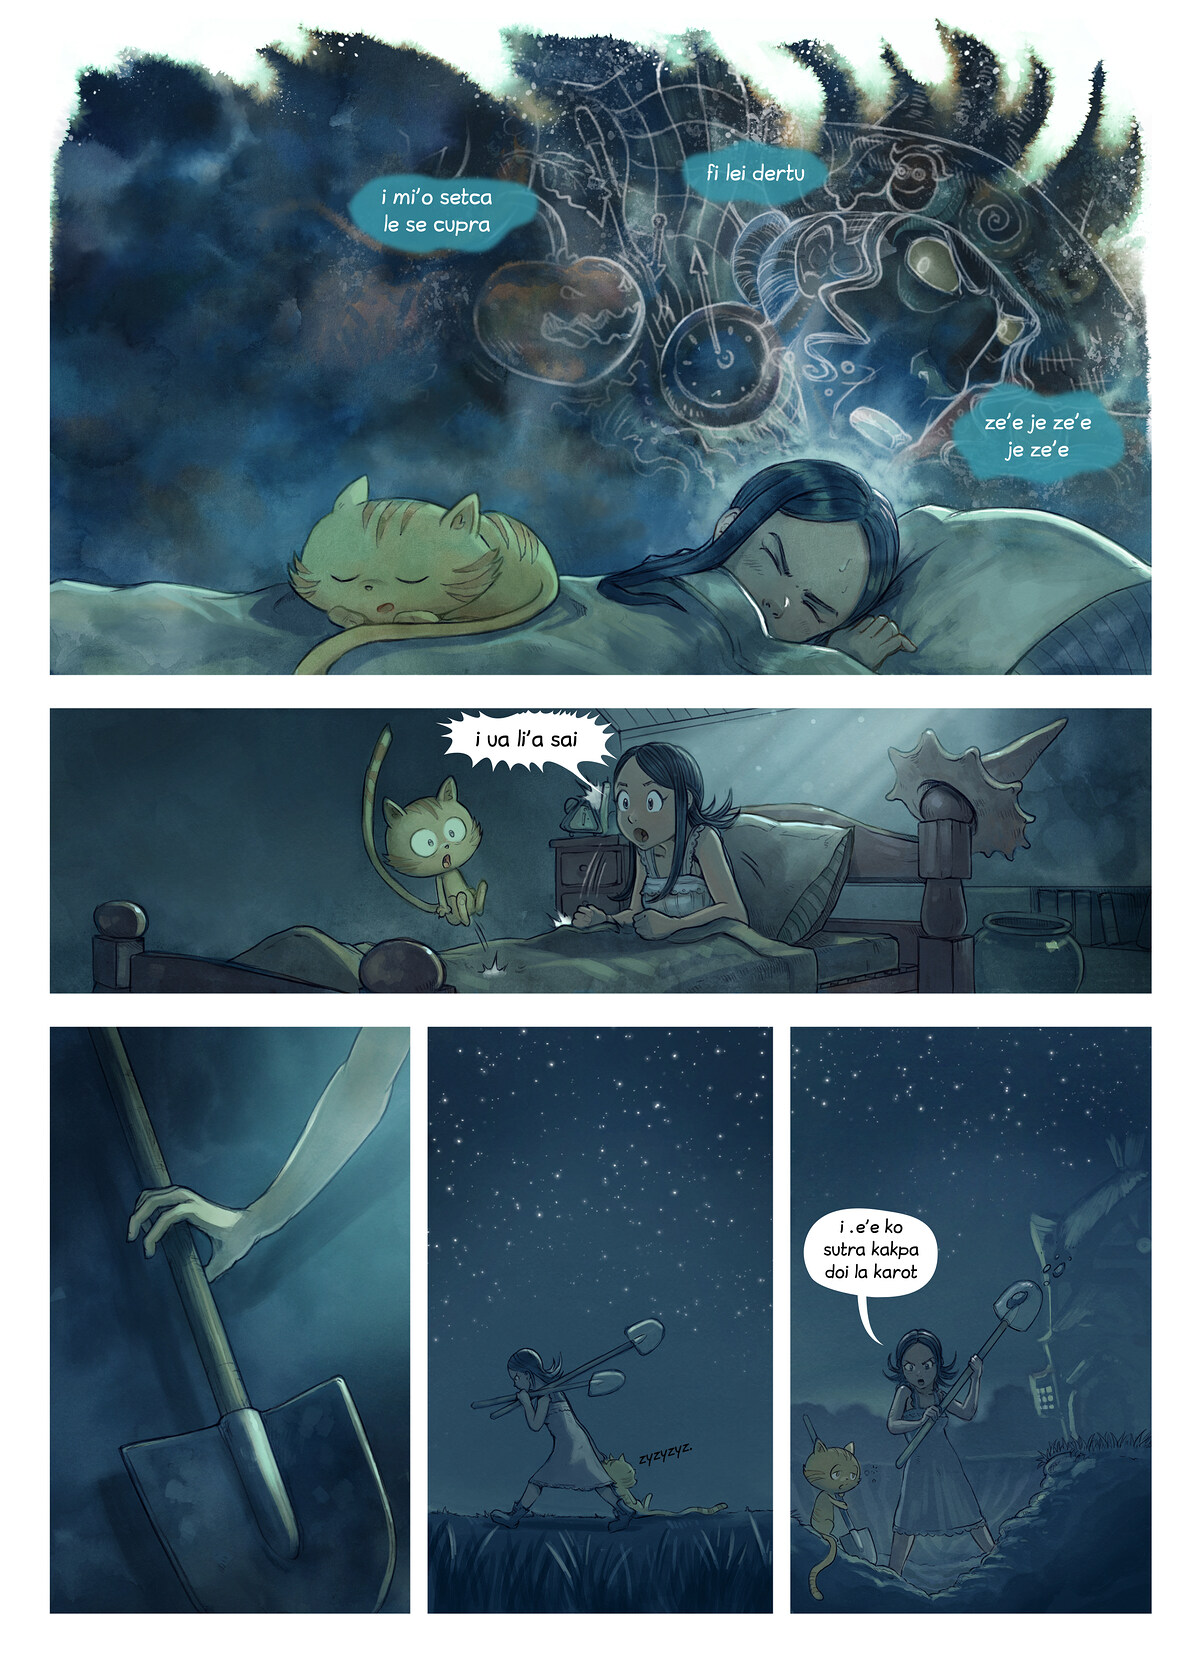 A webcomic page of Pepper&Carrot, pagbu 19 [jb], papri 3